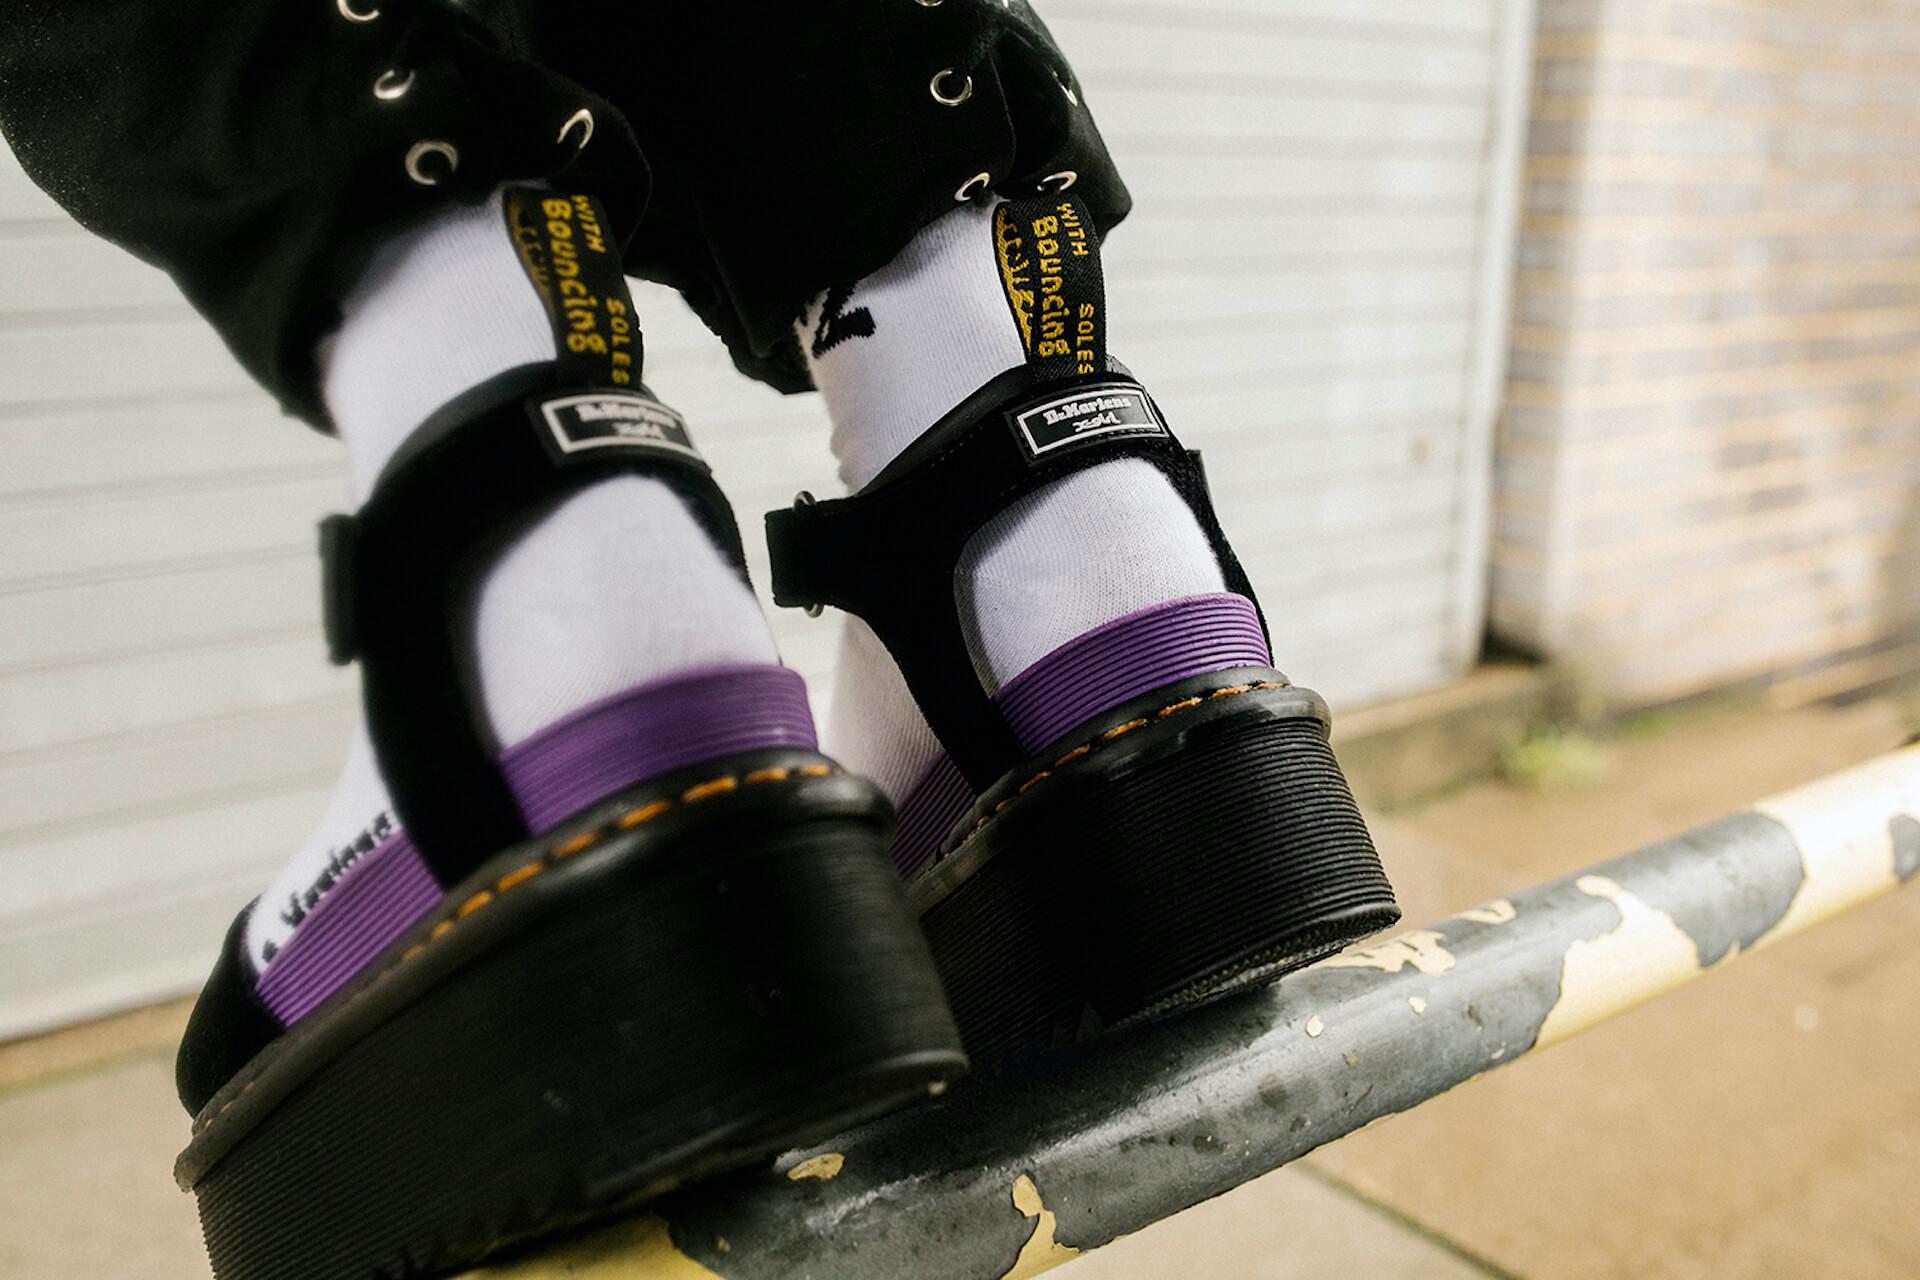 Dr.MartensとX-girlが2度目のコラボコレクションを発表!定番厚底ブーツ&厚底サンダルをベースにした2モデル fation210607_DR.MARTENS-x-X-GIRL-8